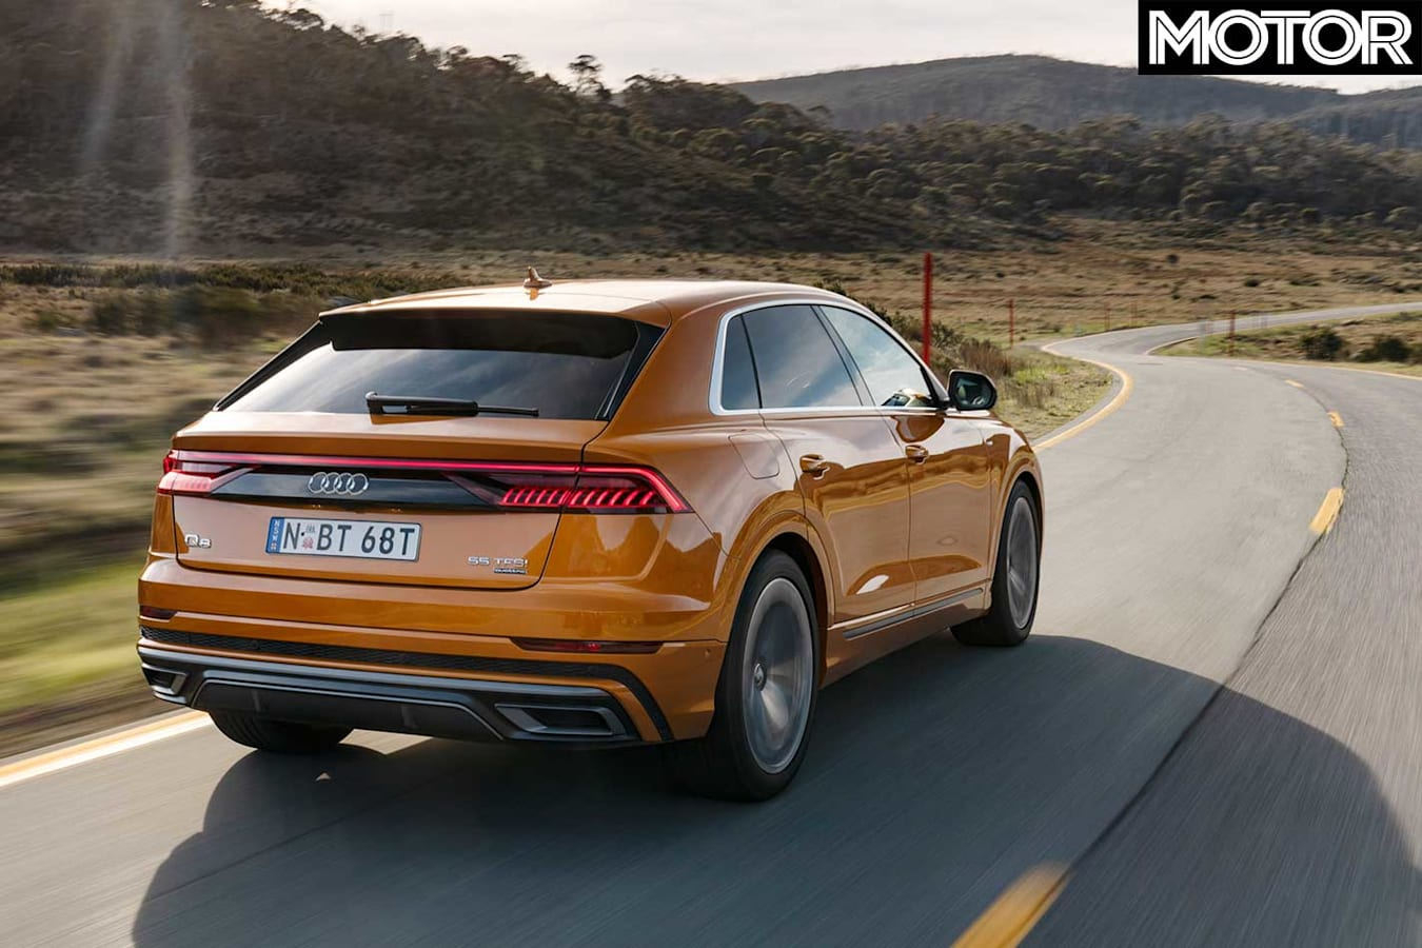 2019 Audi Q 8 55 TFSI Rear Dynamic Jpg